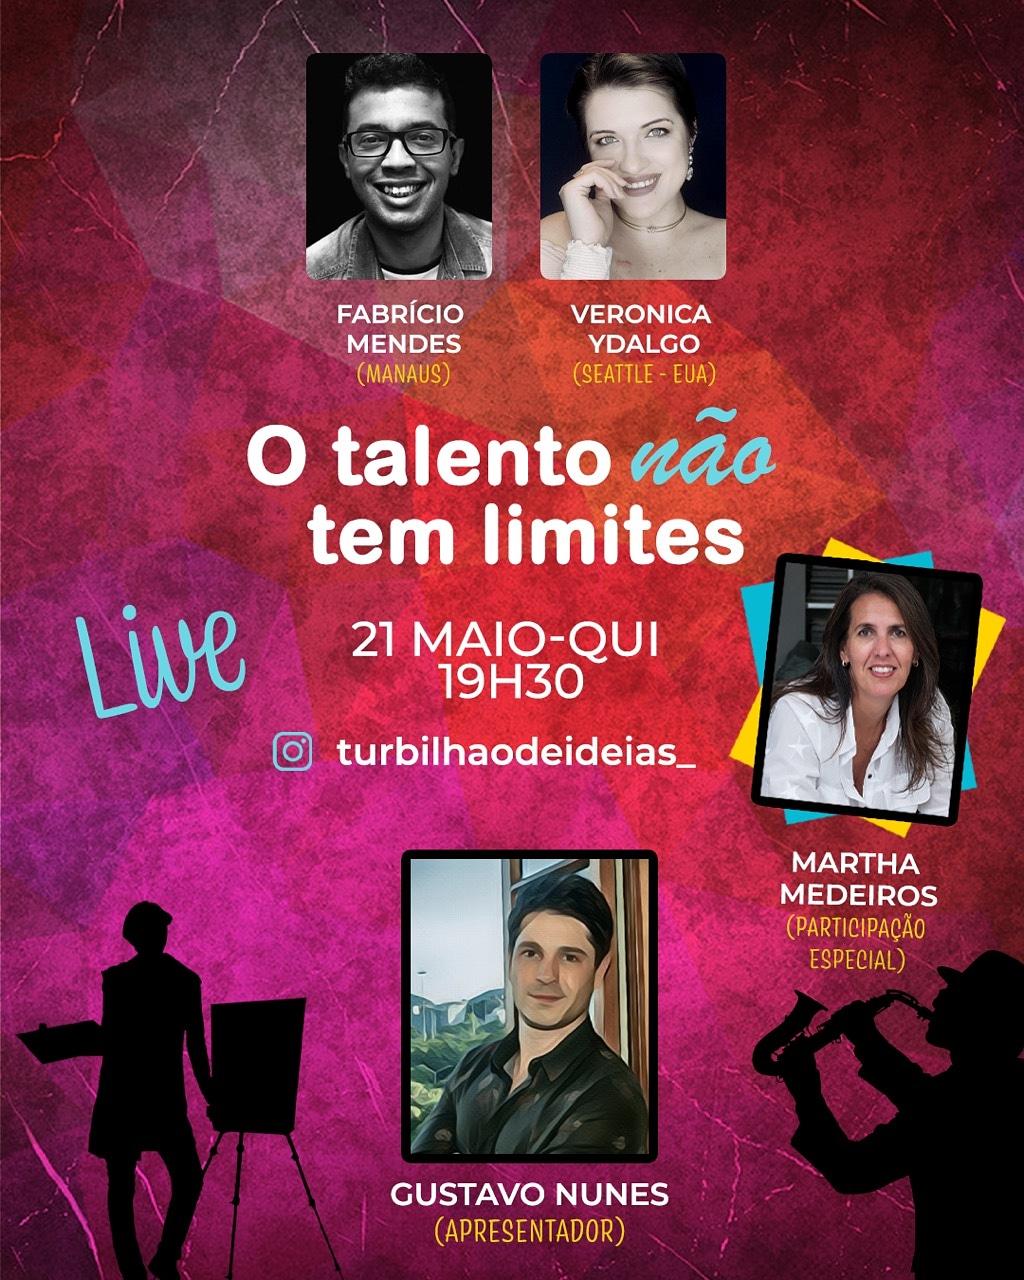 Artista Amazonense Fabrício Mendes se apresenta para todo o Brasil no Projeto Nacional de arte realizado por produtora do Rio de Janeiro.